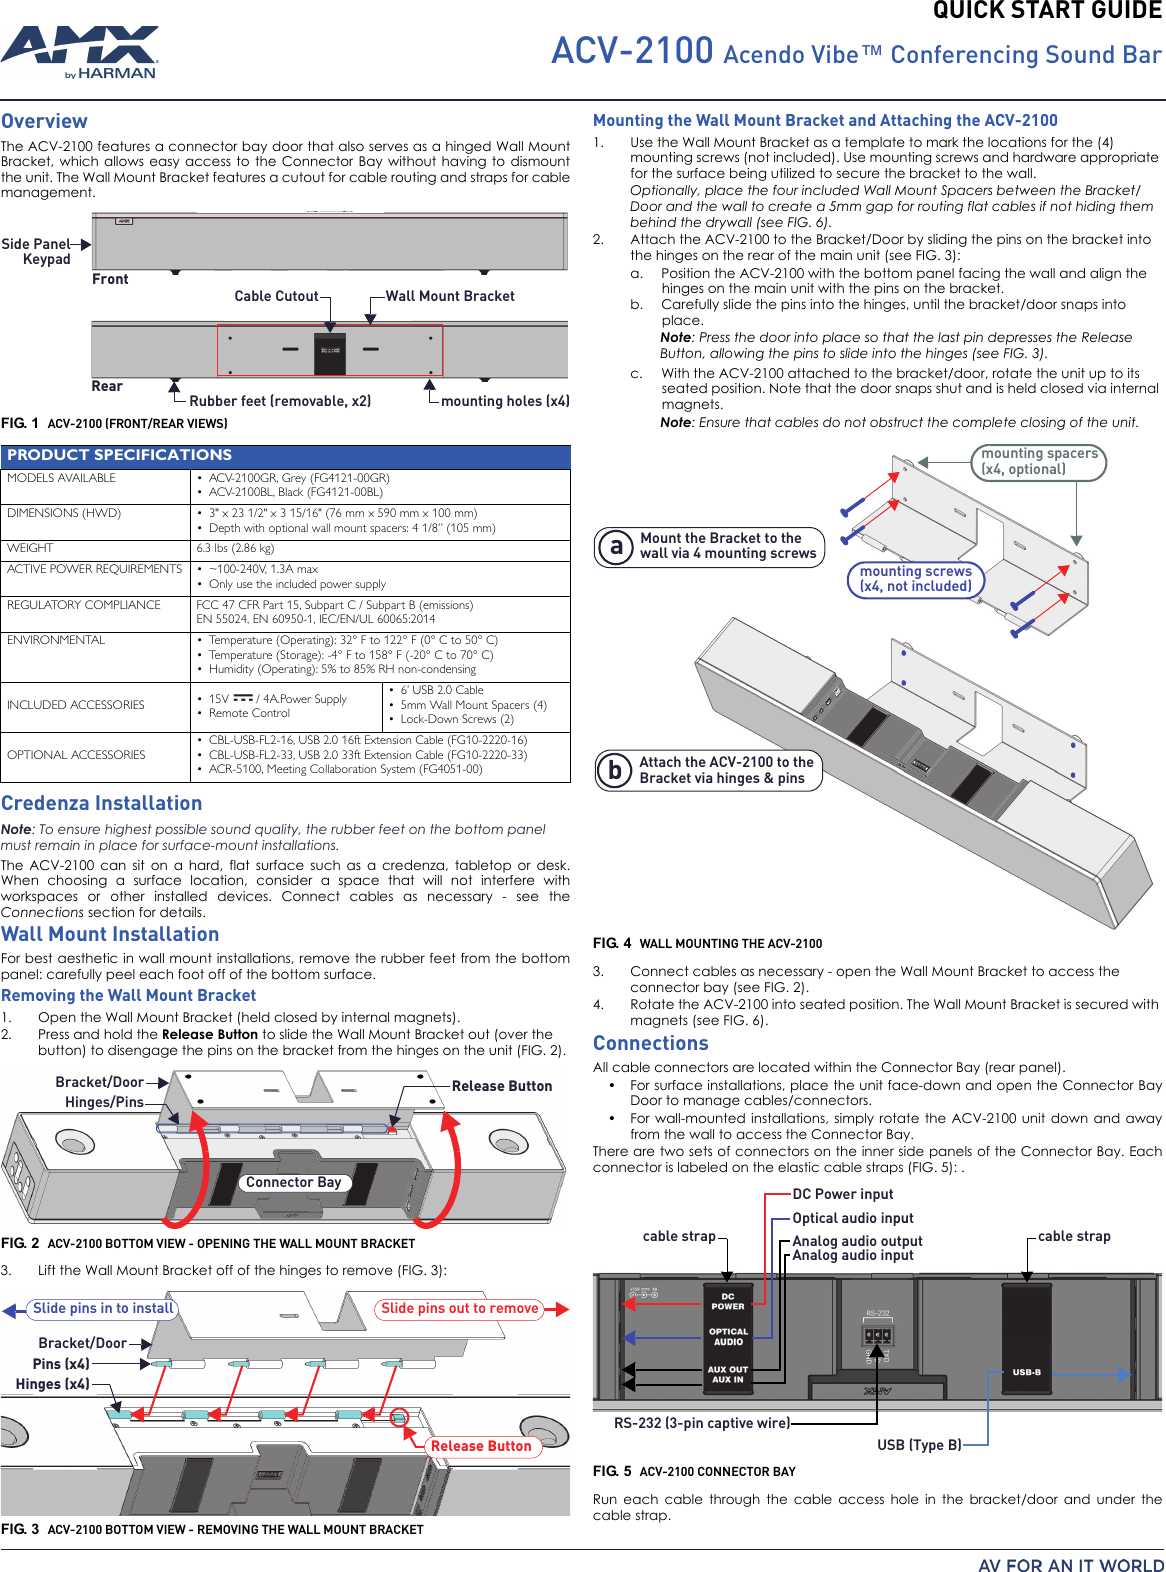 Amx nmx-enc-n2122 user guide